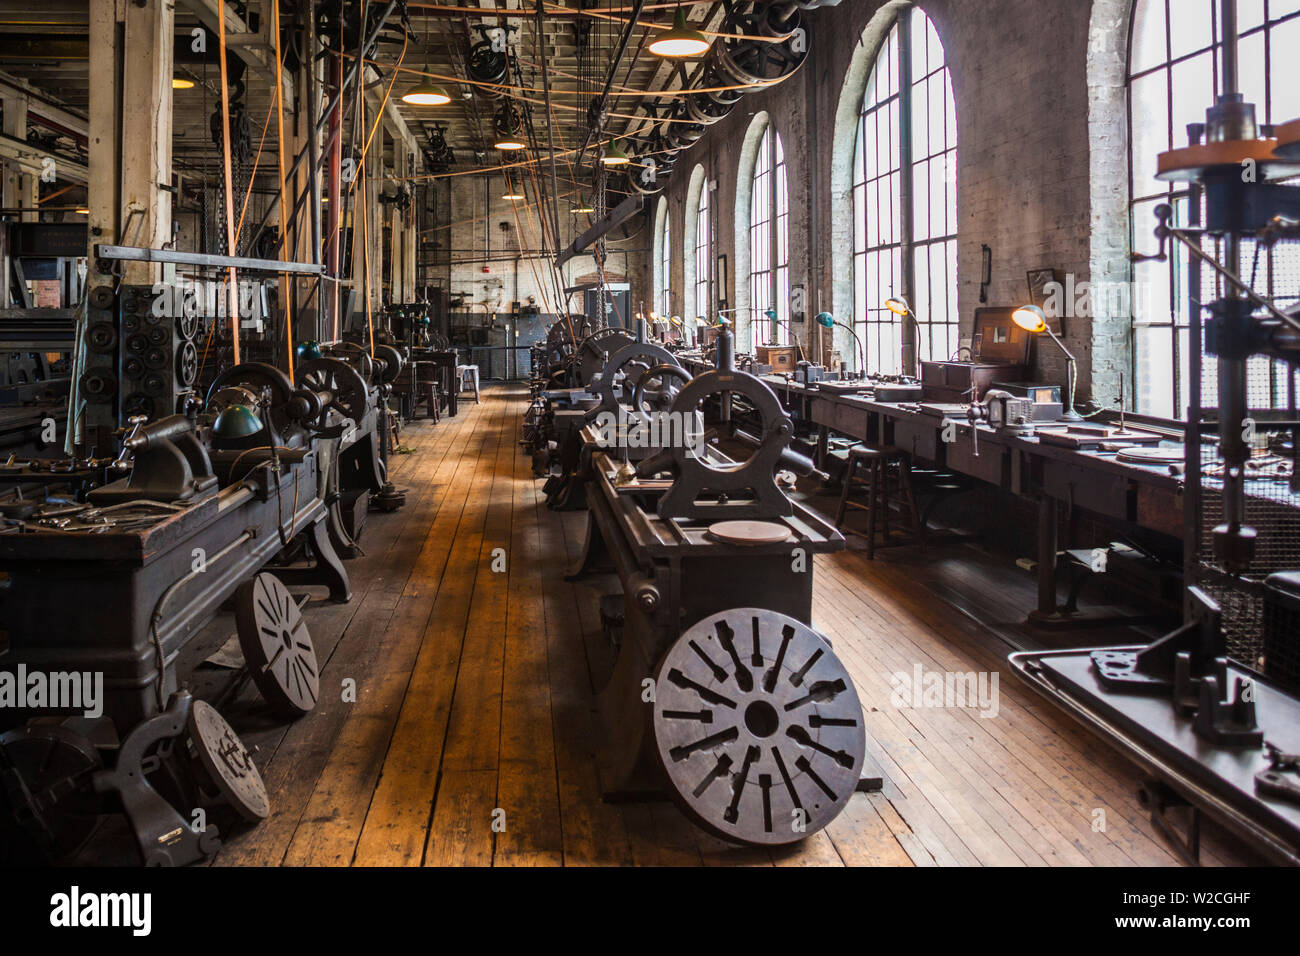 USA, New Jersey, West Orange, Thomas Edison National Historical Park, Interieur, Fabrikhalle Stockfoto